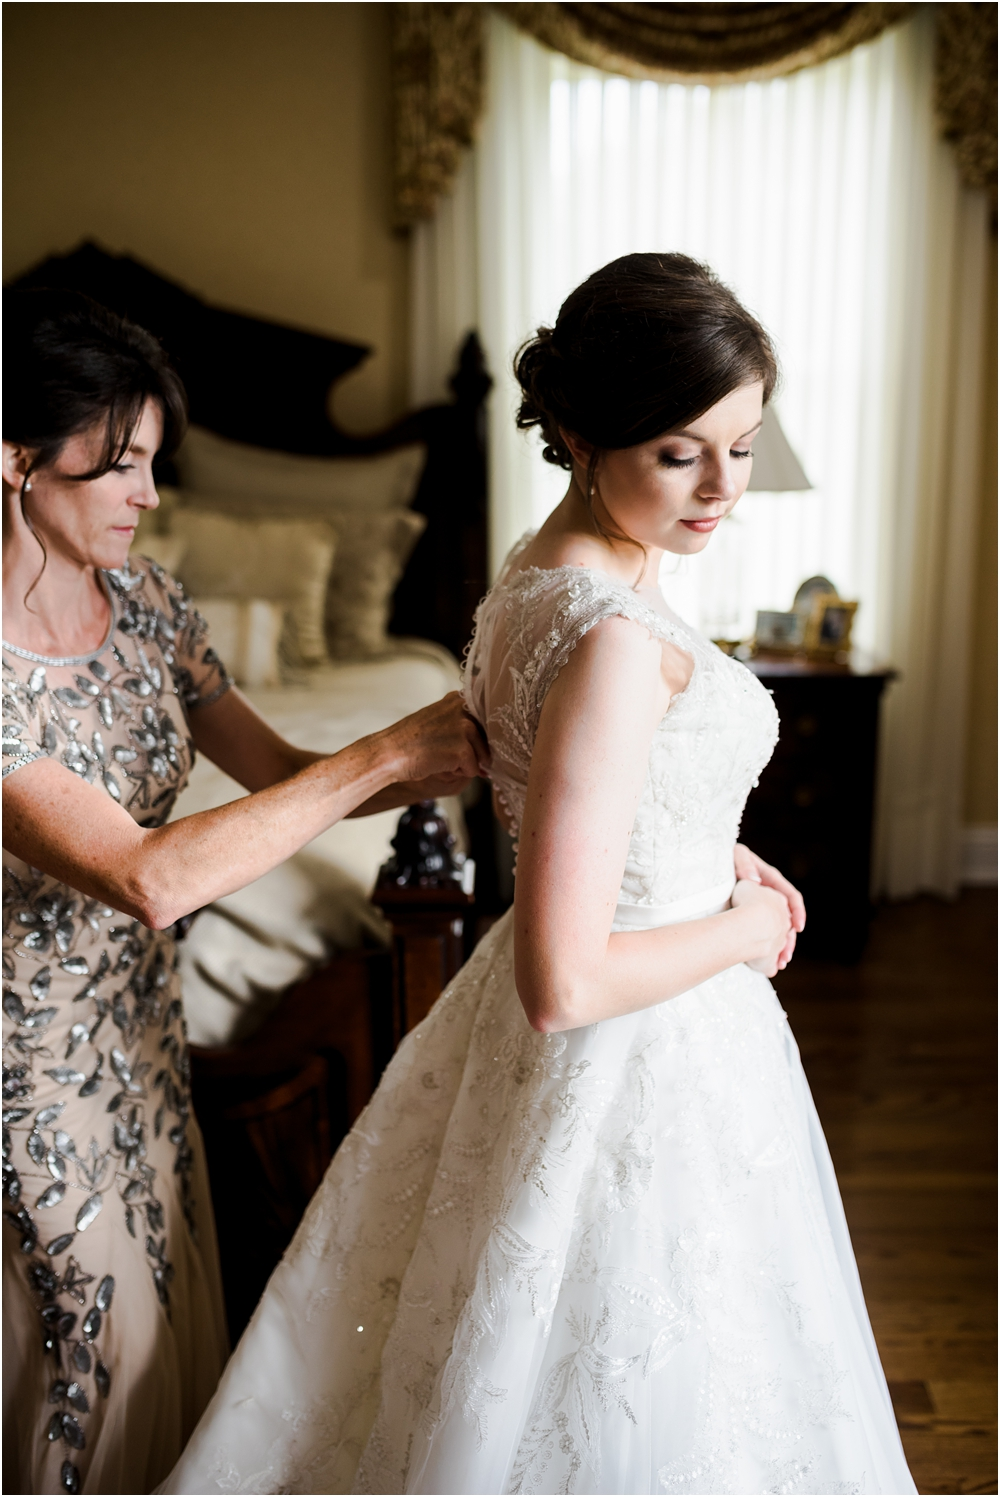 marianna-florida-wedding-photographer-kiersten-grant-26.jpg